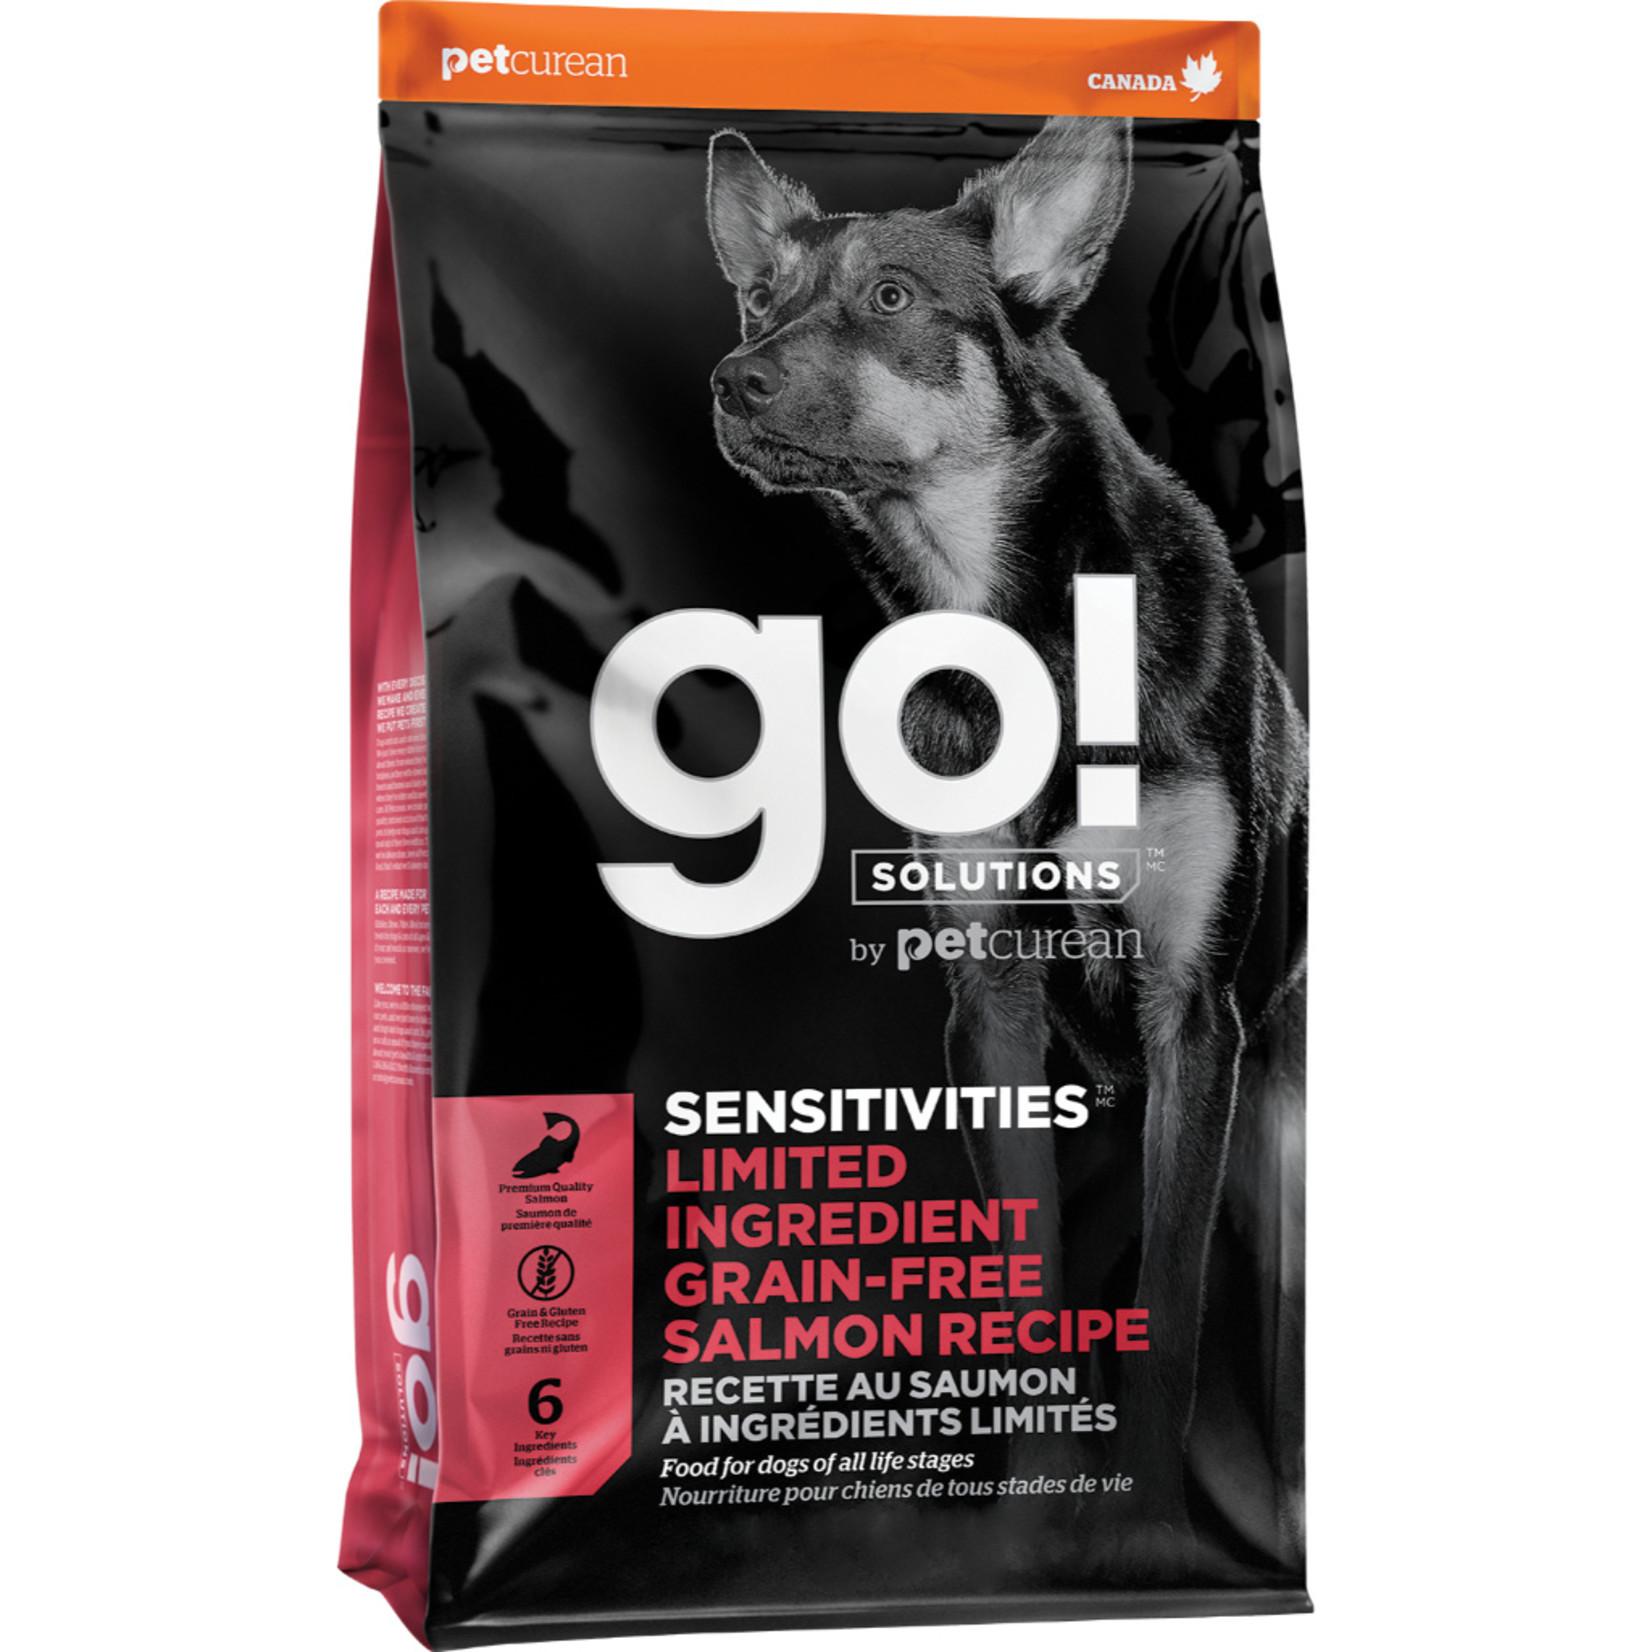 Go! Go! Sensitivities LID grain free Salmon